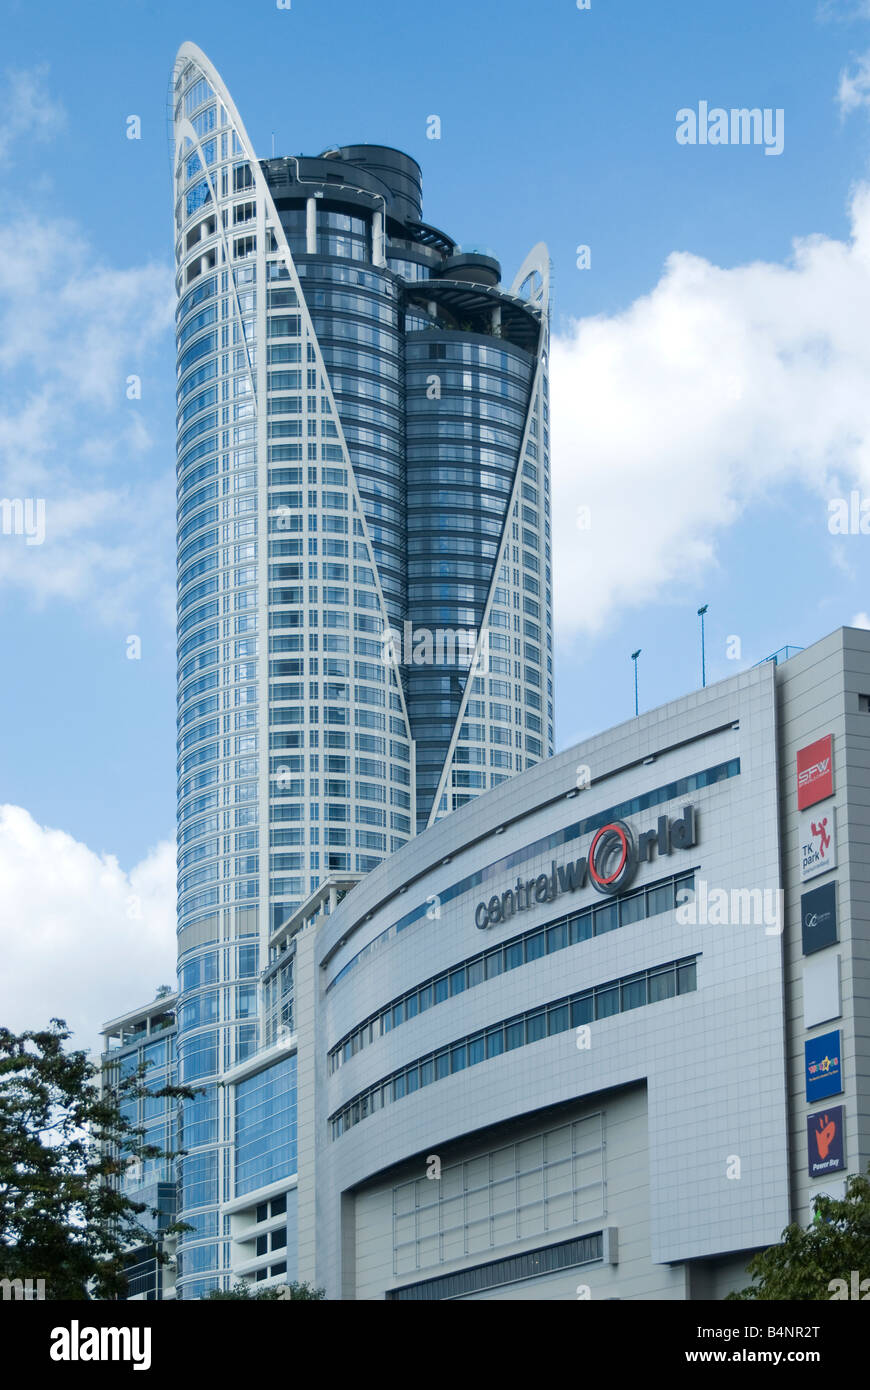 Centara Grand Hotel and Central World Plaza in Bangkok - Stock Image